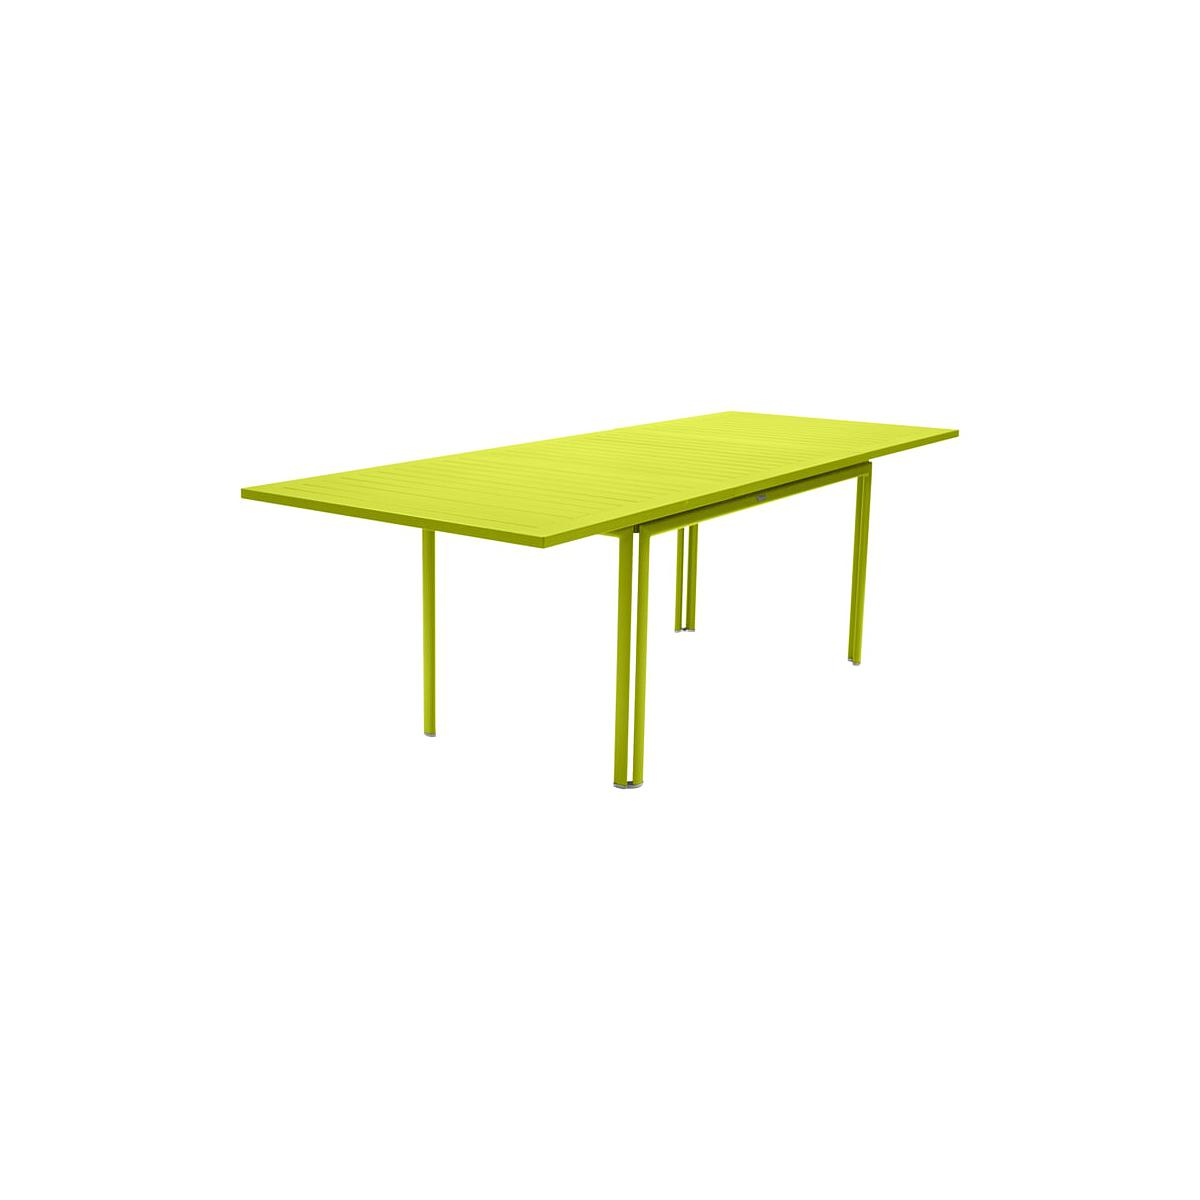 COSTA by Fermob table à allonge verveine